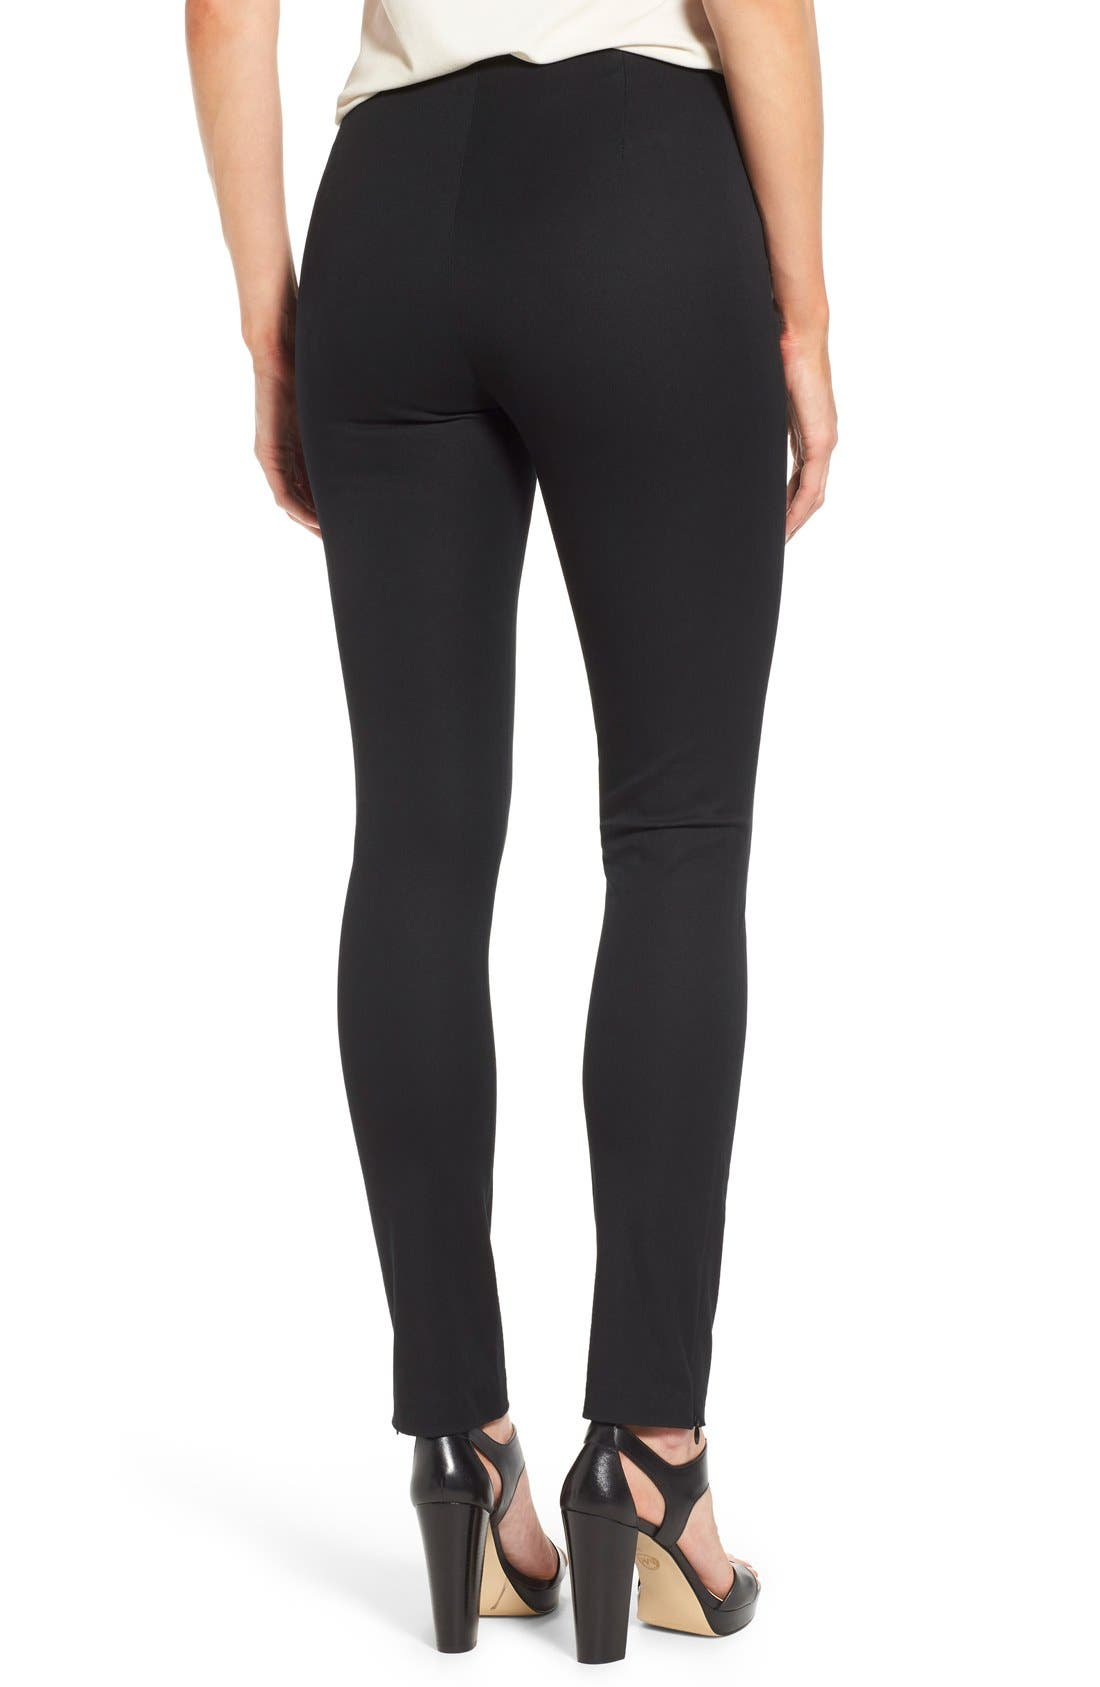 Alternate Image 2  - MICHAEL Michael Kors 'Hutton' Ankle Zip Slim Pintuck Pants (Petite)